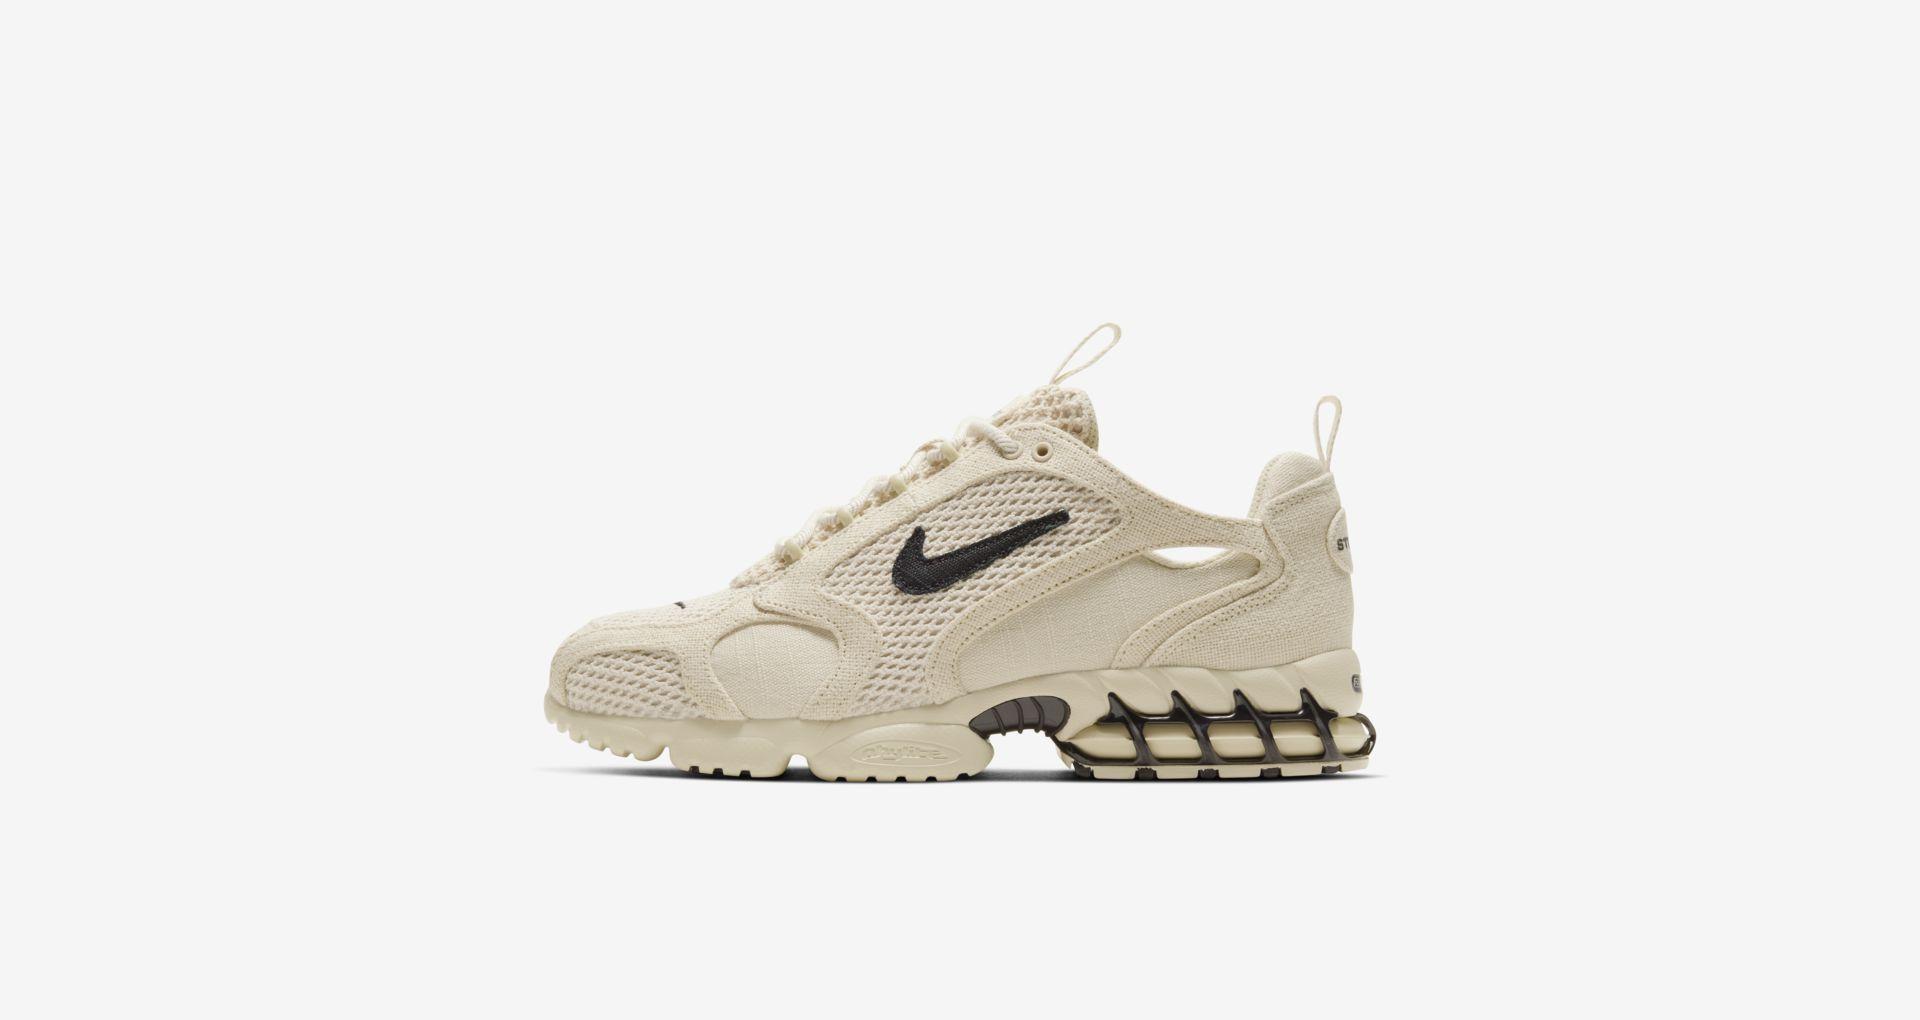 Stüssy,Nike,CU1854-001,CQ5486-  Stüssy x Nike 联名明早 9 点发售!泫雅抢先上脚!